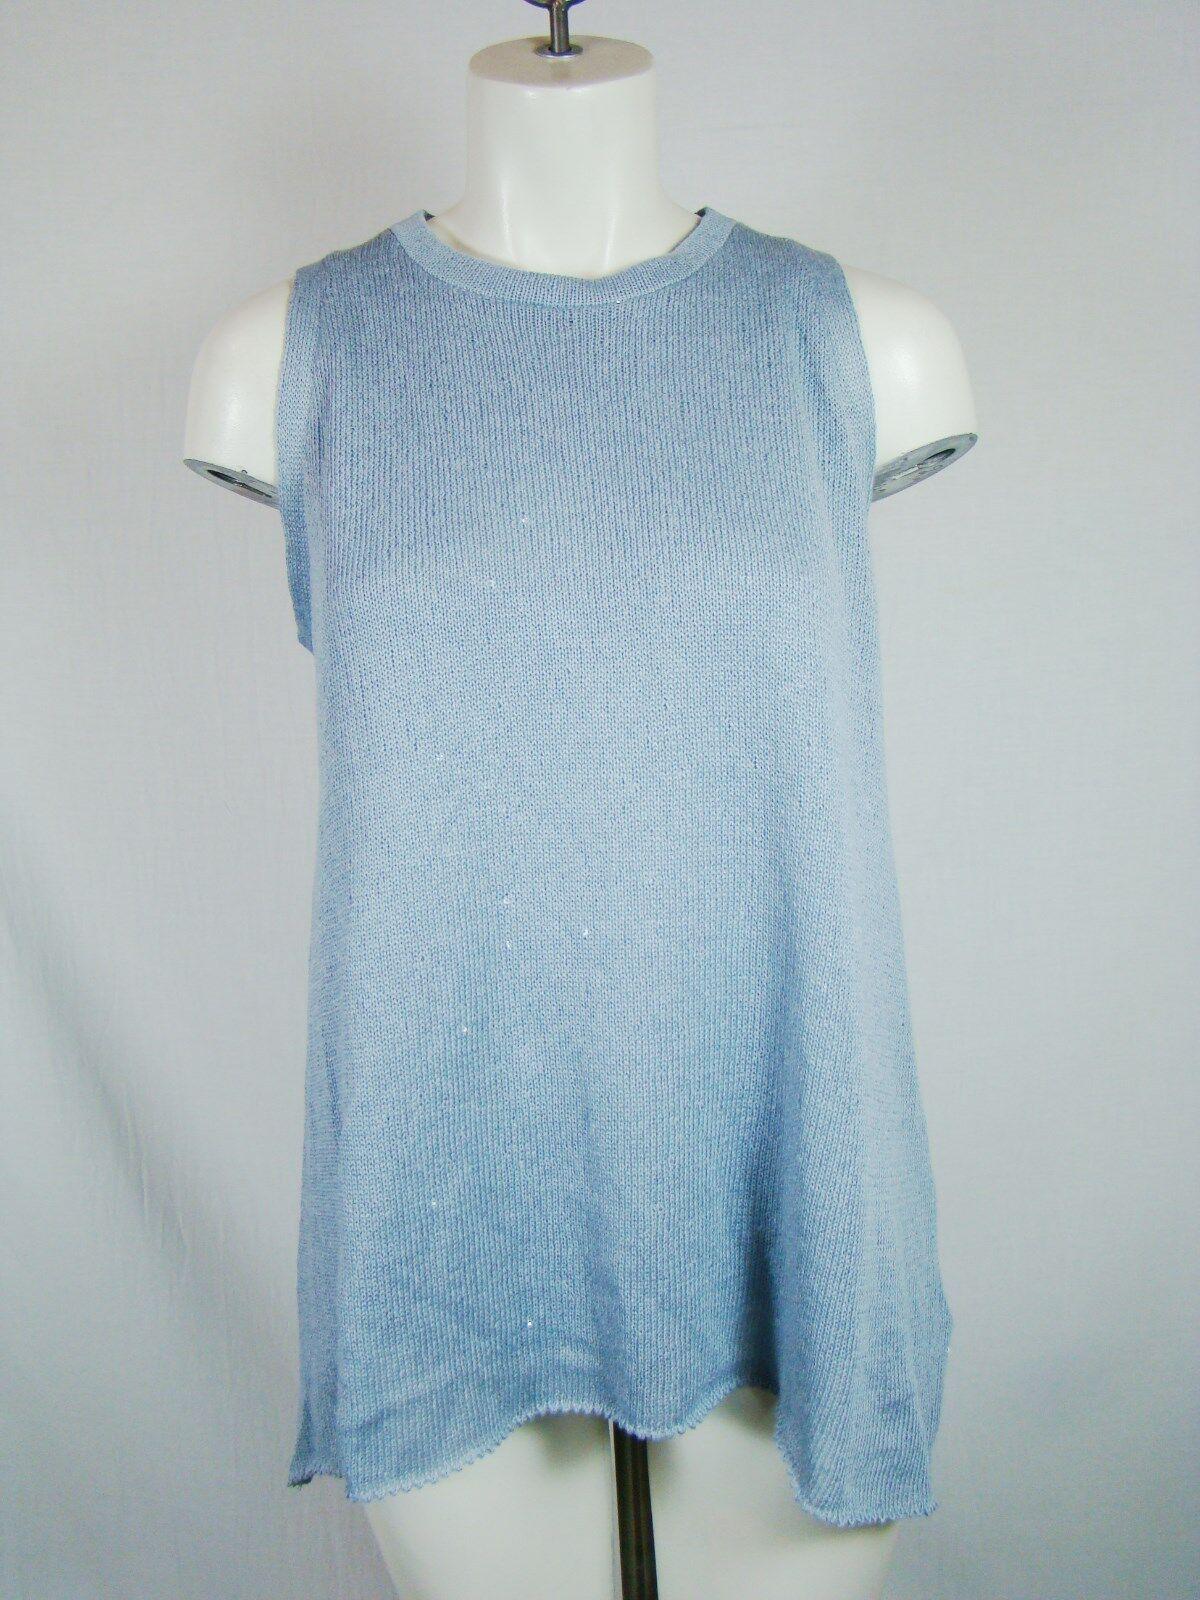 Brunello Cucinelli Sequin Linen Silk bluee Tank Top Sweater L Large